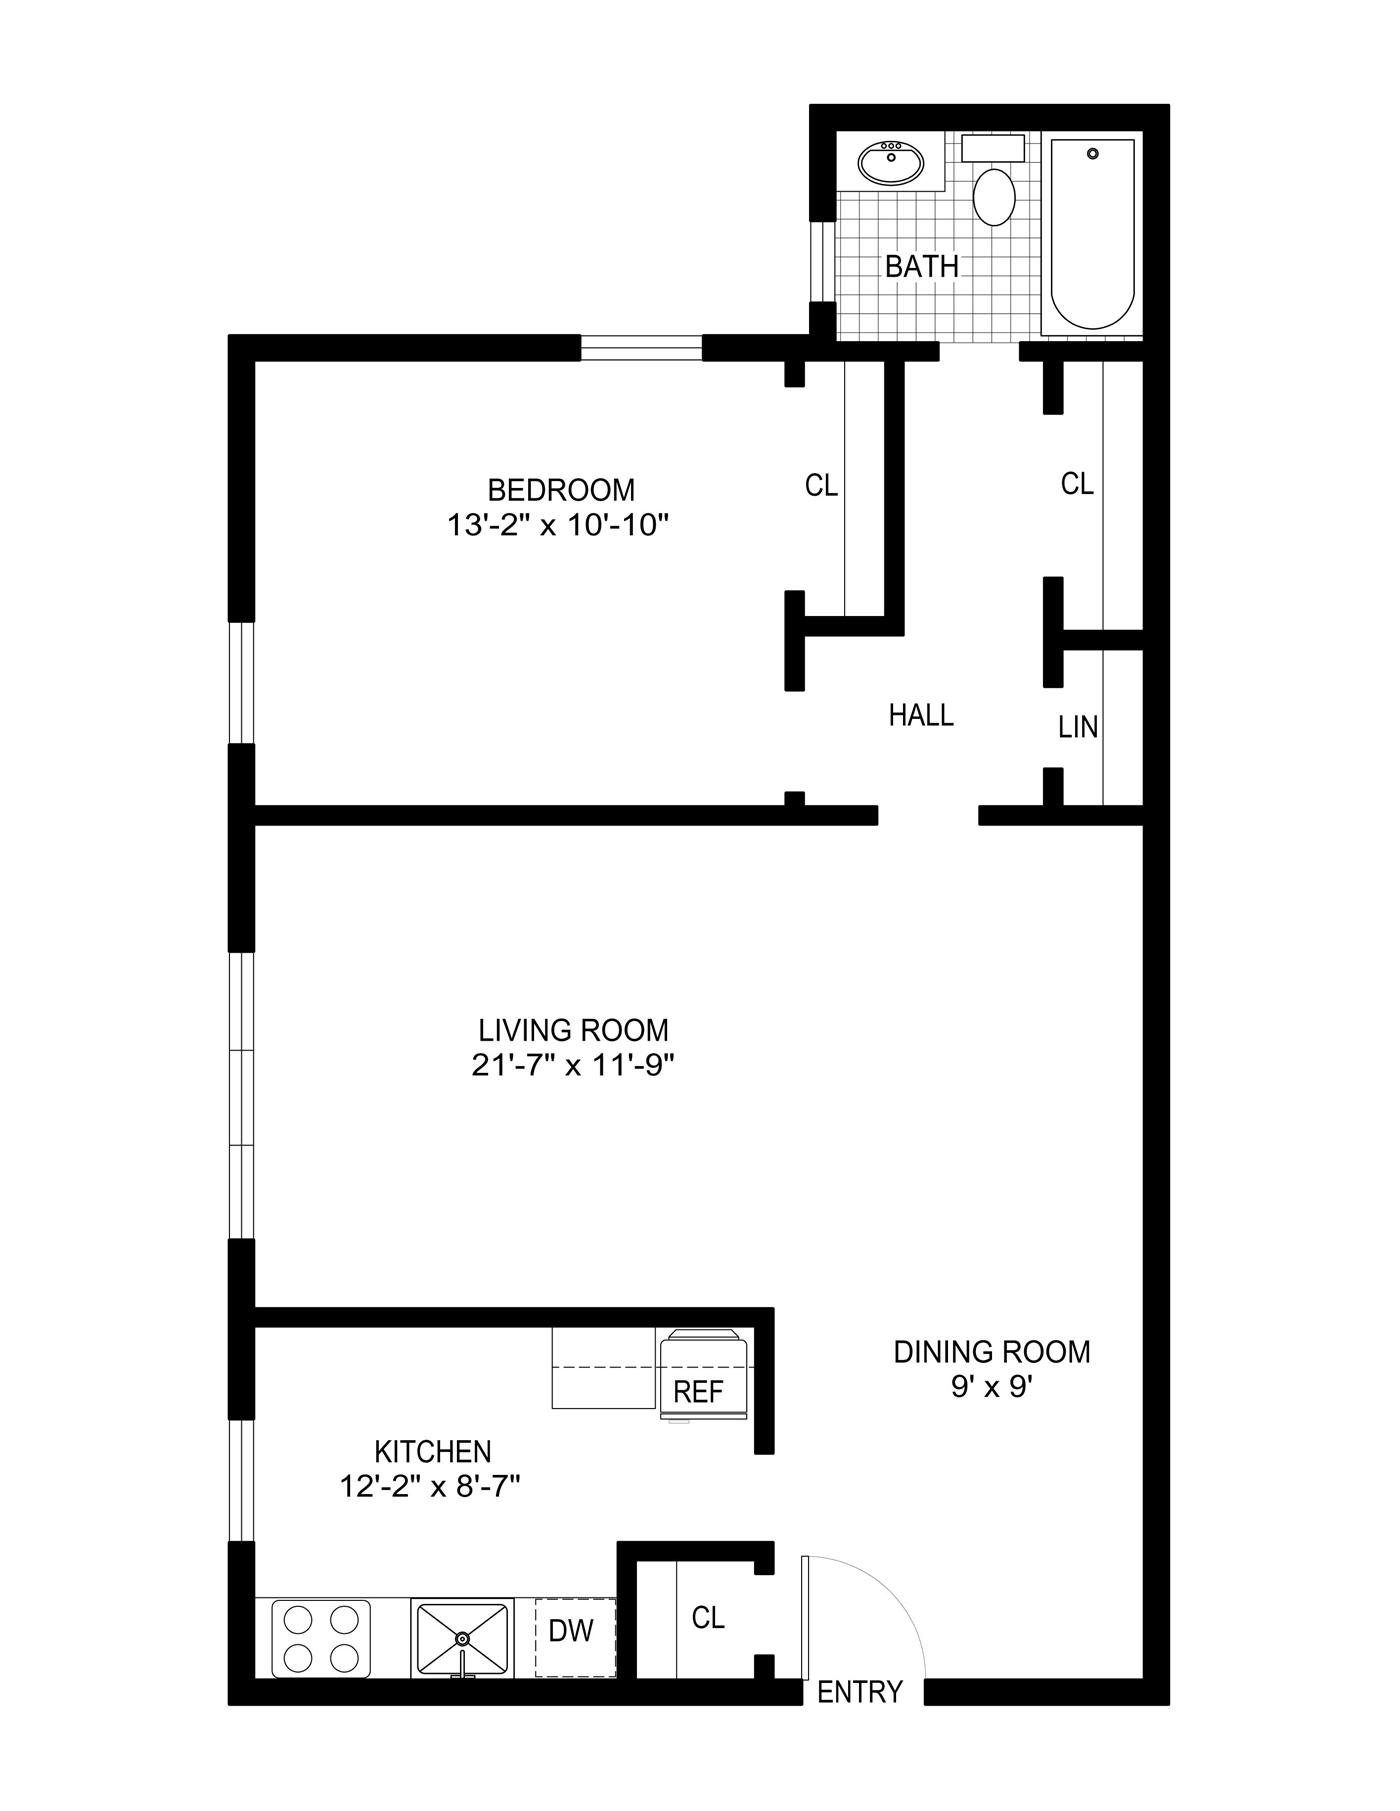 Office furniture templates for floor plans 100 floor for 3d home design 64 bit